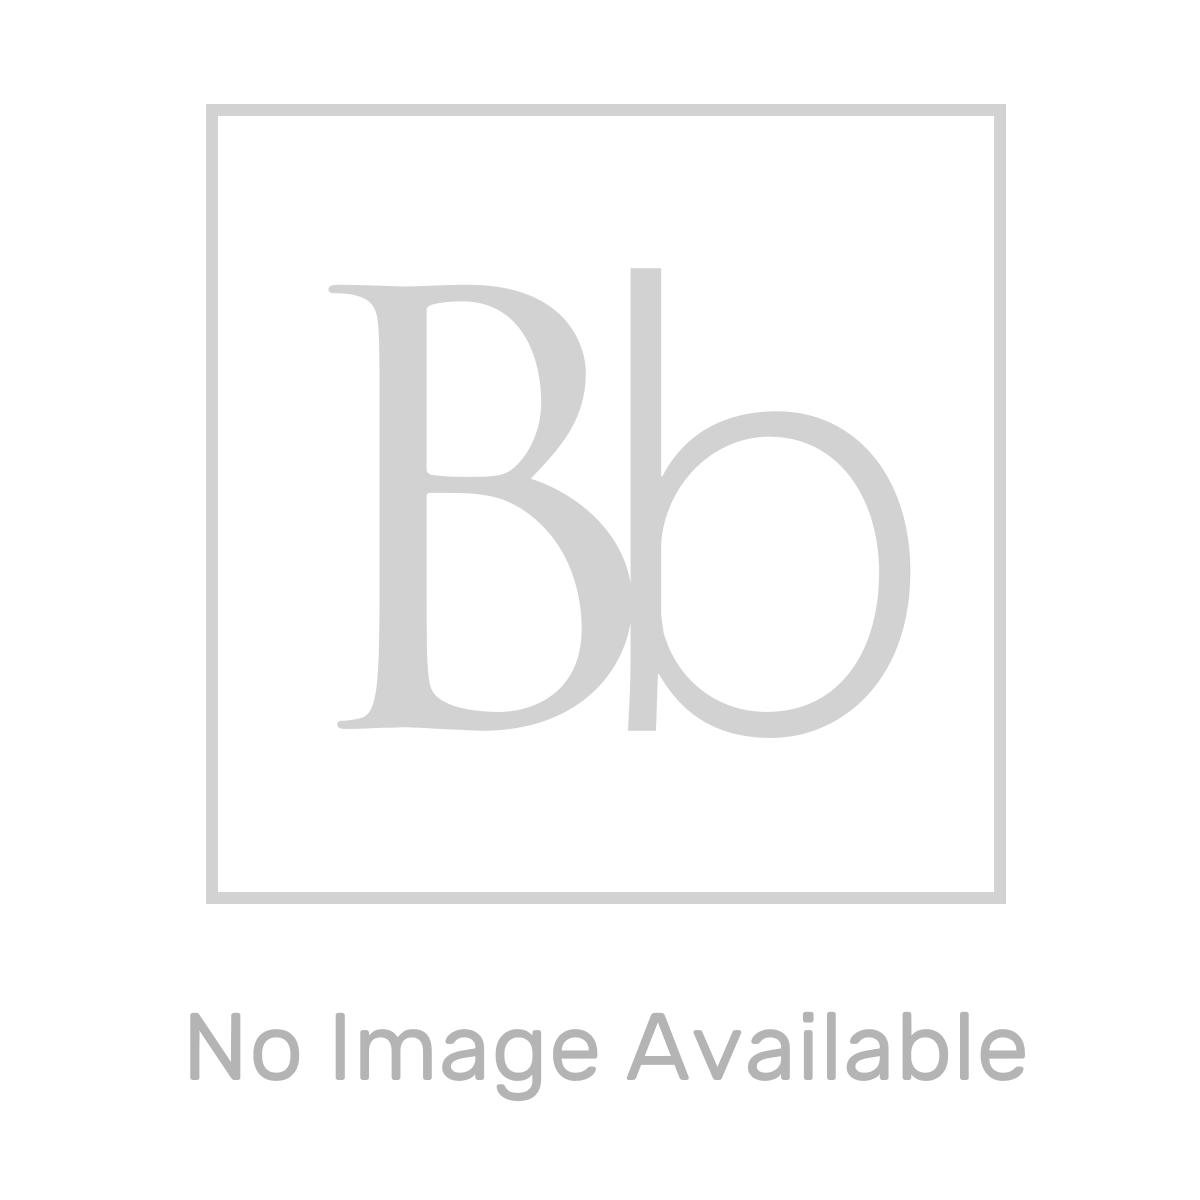 RAK Feeling Grey Rectangular Shower Tray 1700 x 900mm Measurements